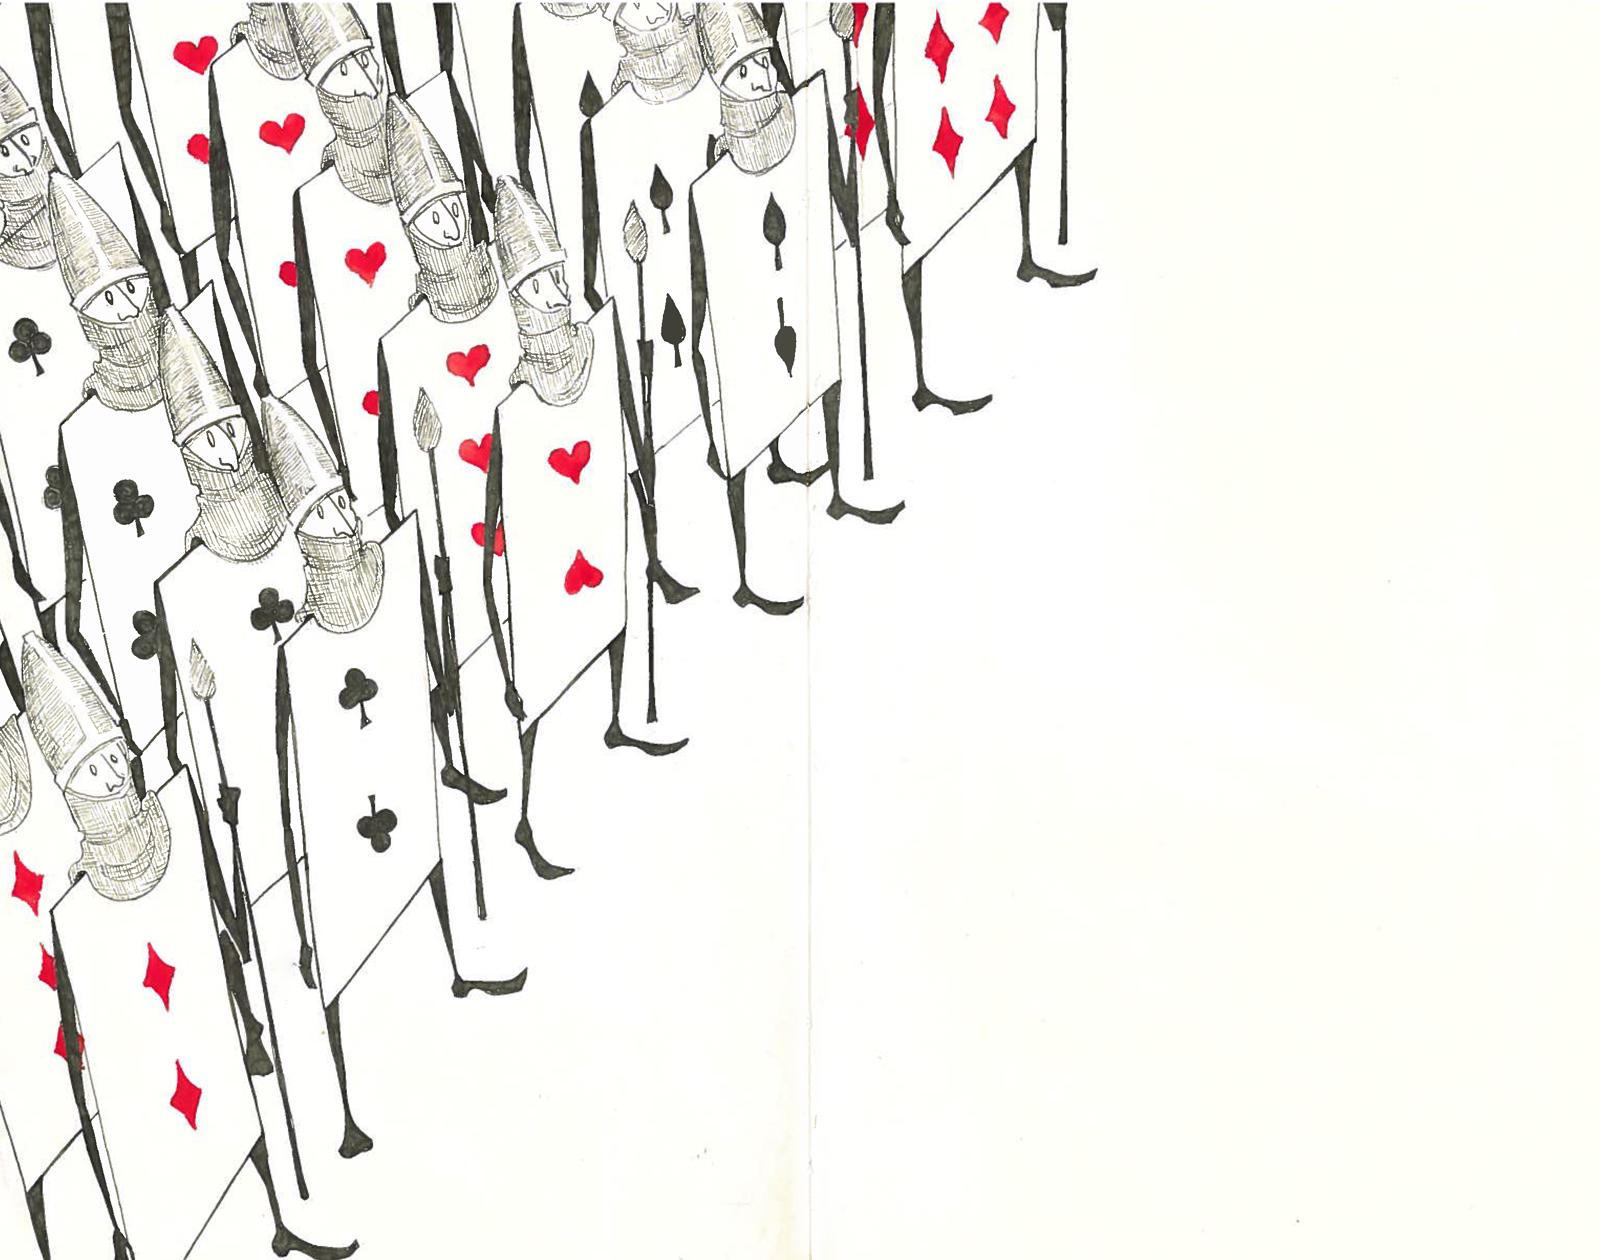 Alice In Wonderland Card Soldiers Template ] - Alice In For Alice In Wonderland Card Soldiers Template